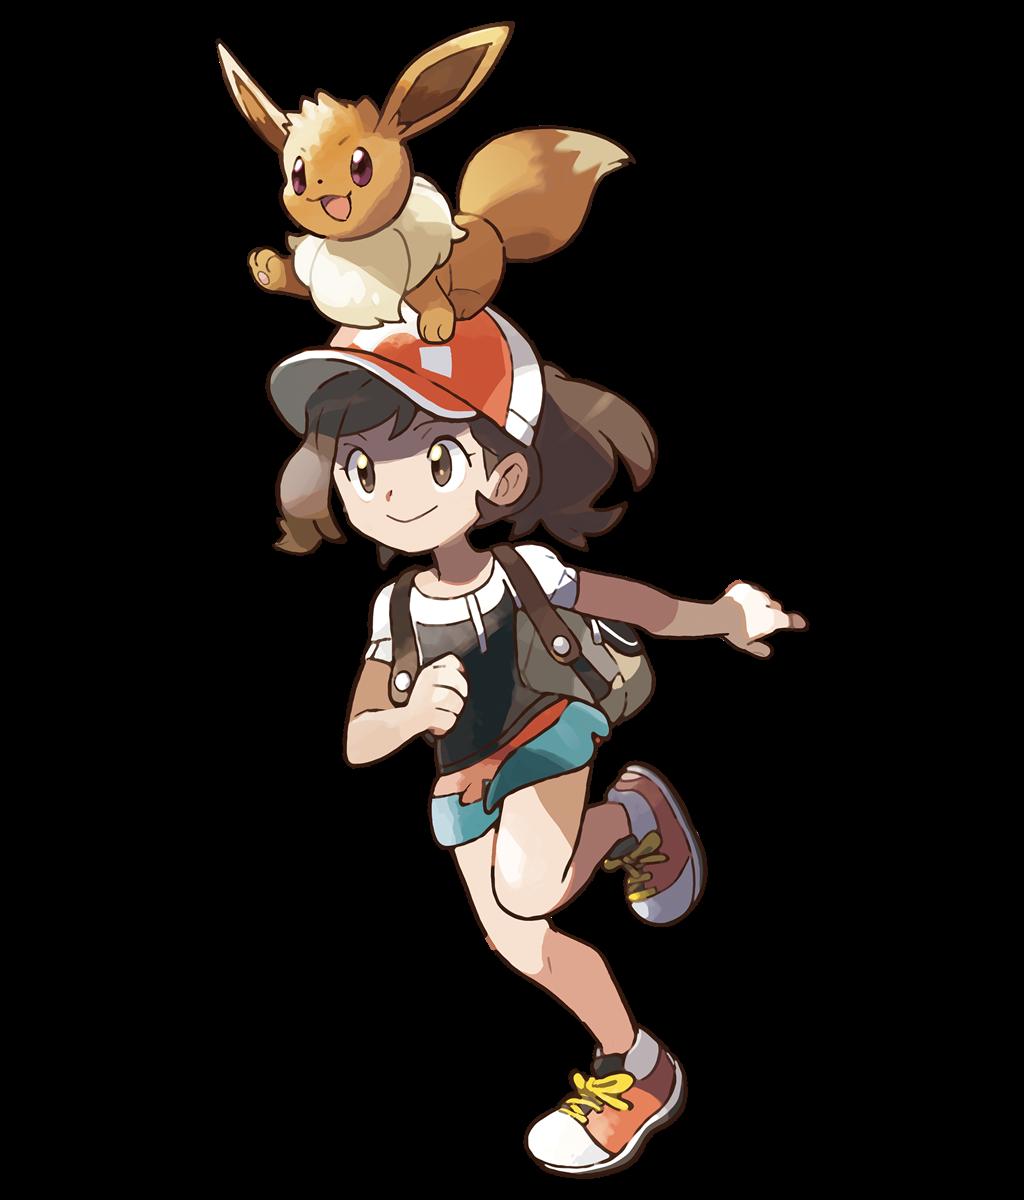 Héros Pokémon Let's Go Pikachu et Pokémon Let's Go Évoli